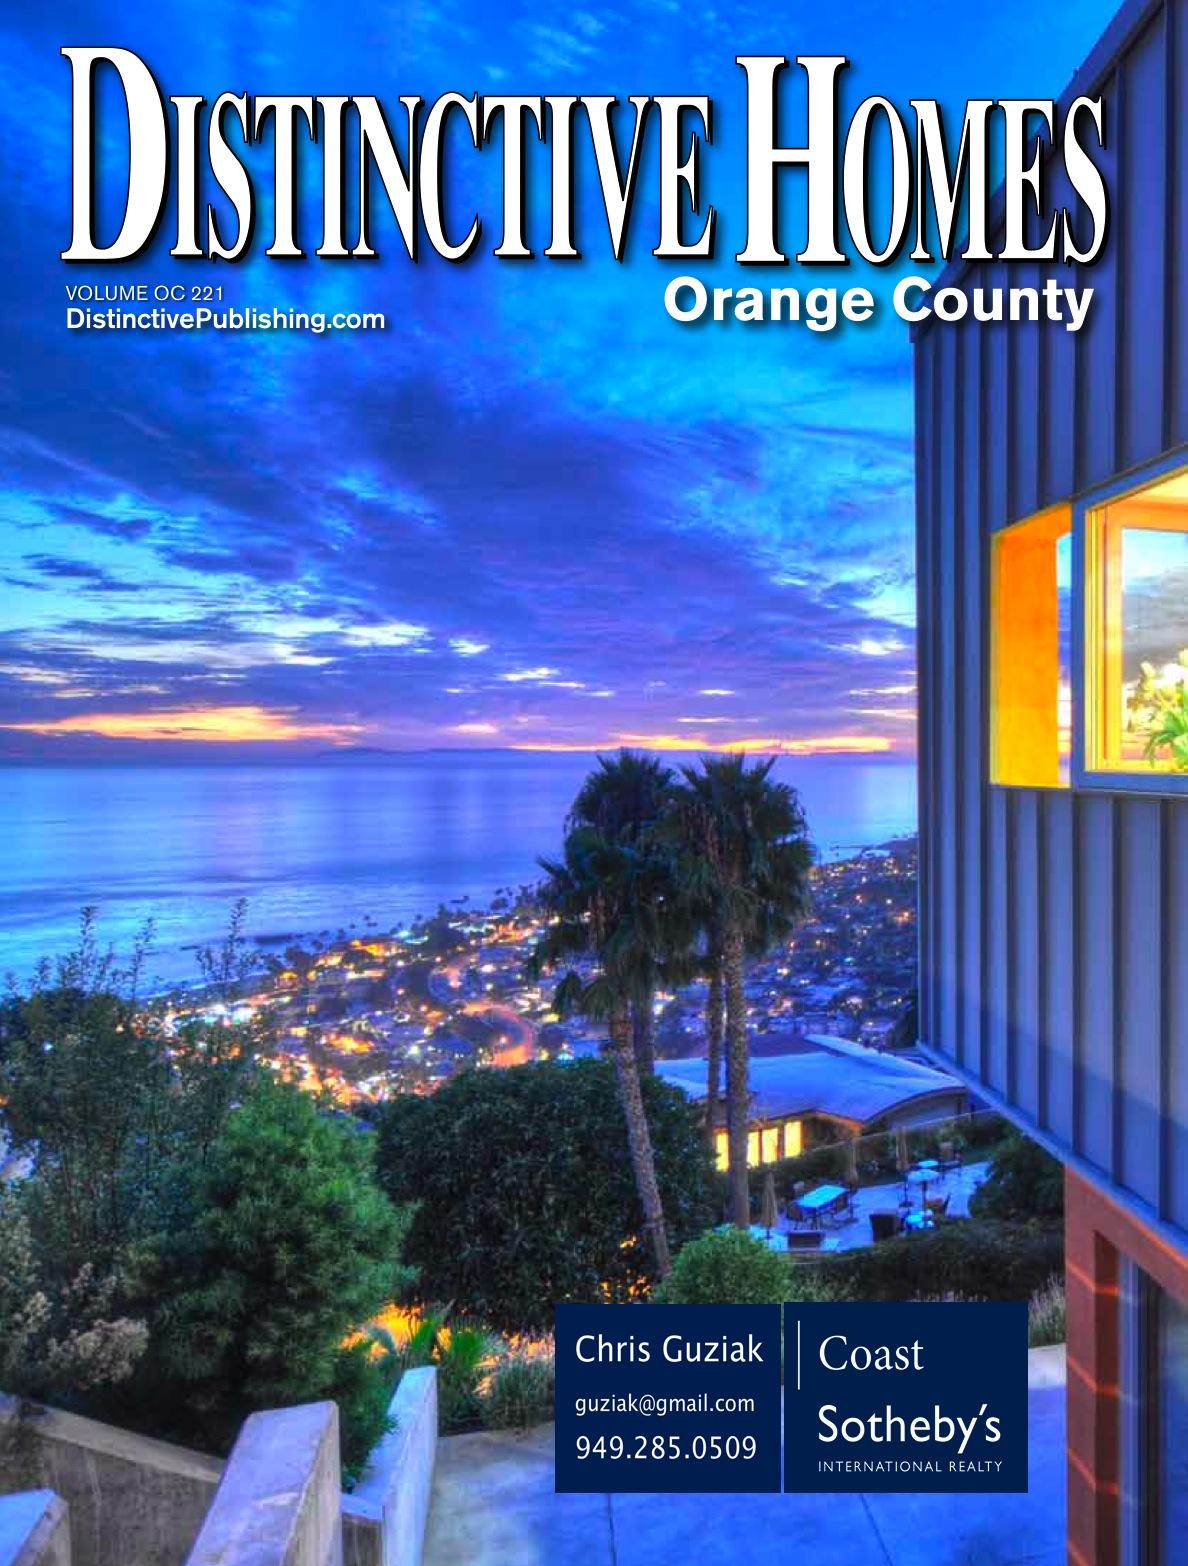 Distinctive Homes cover